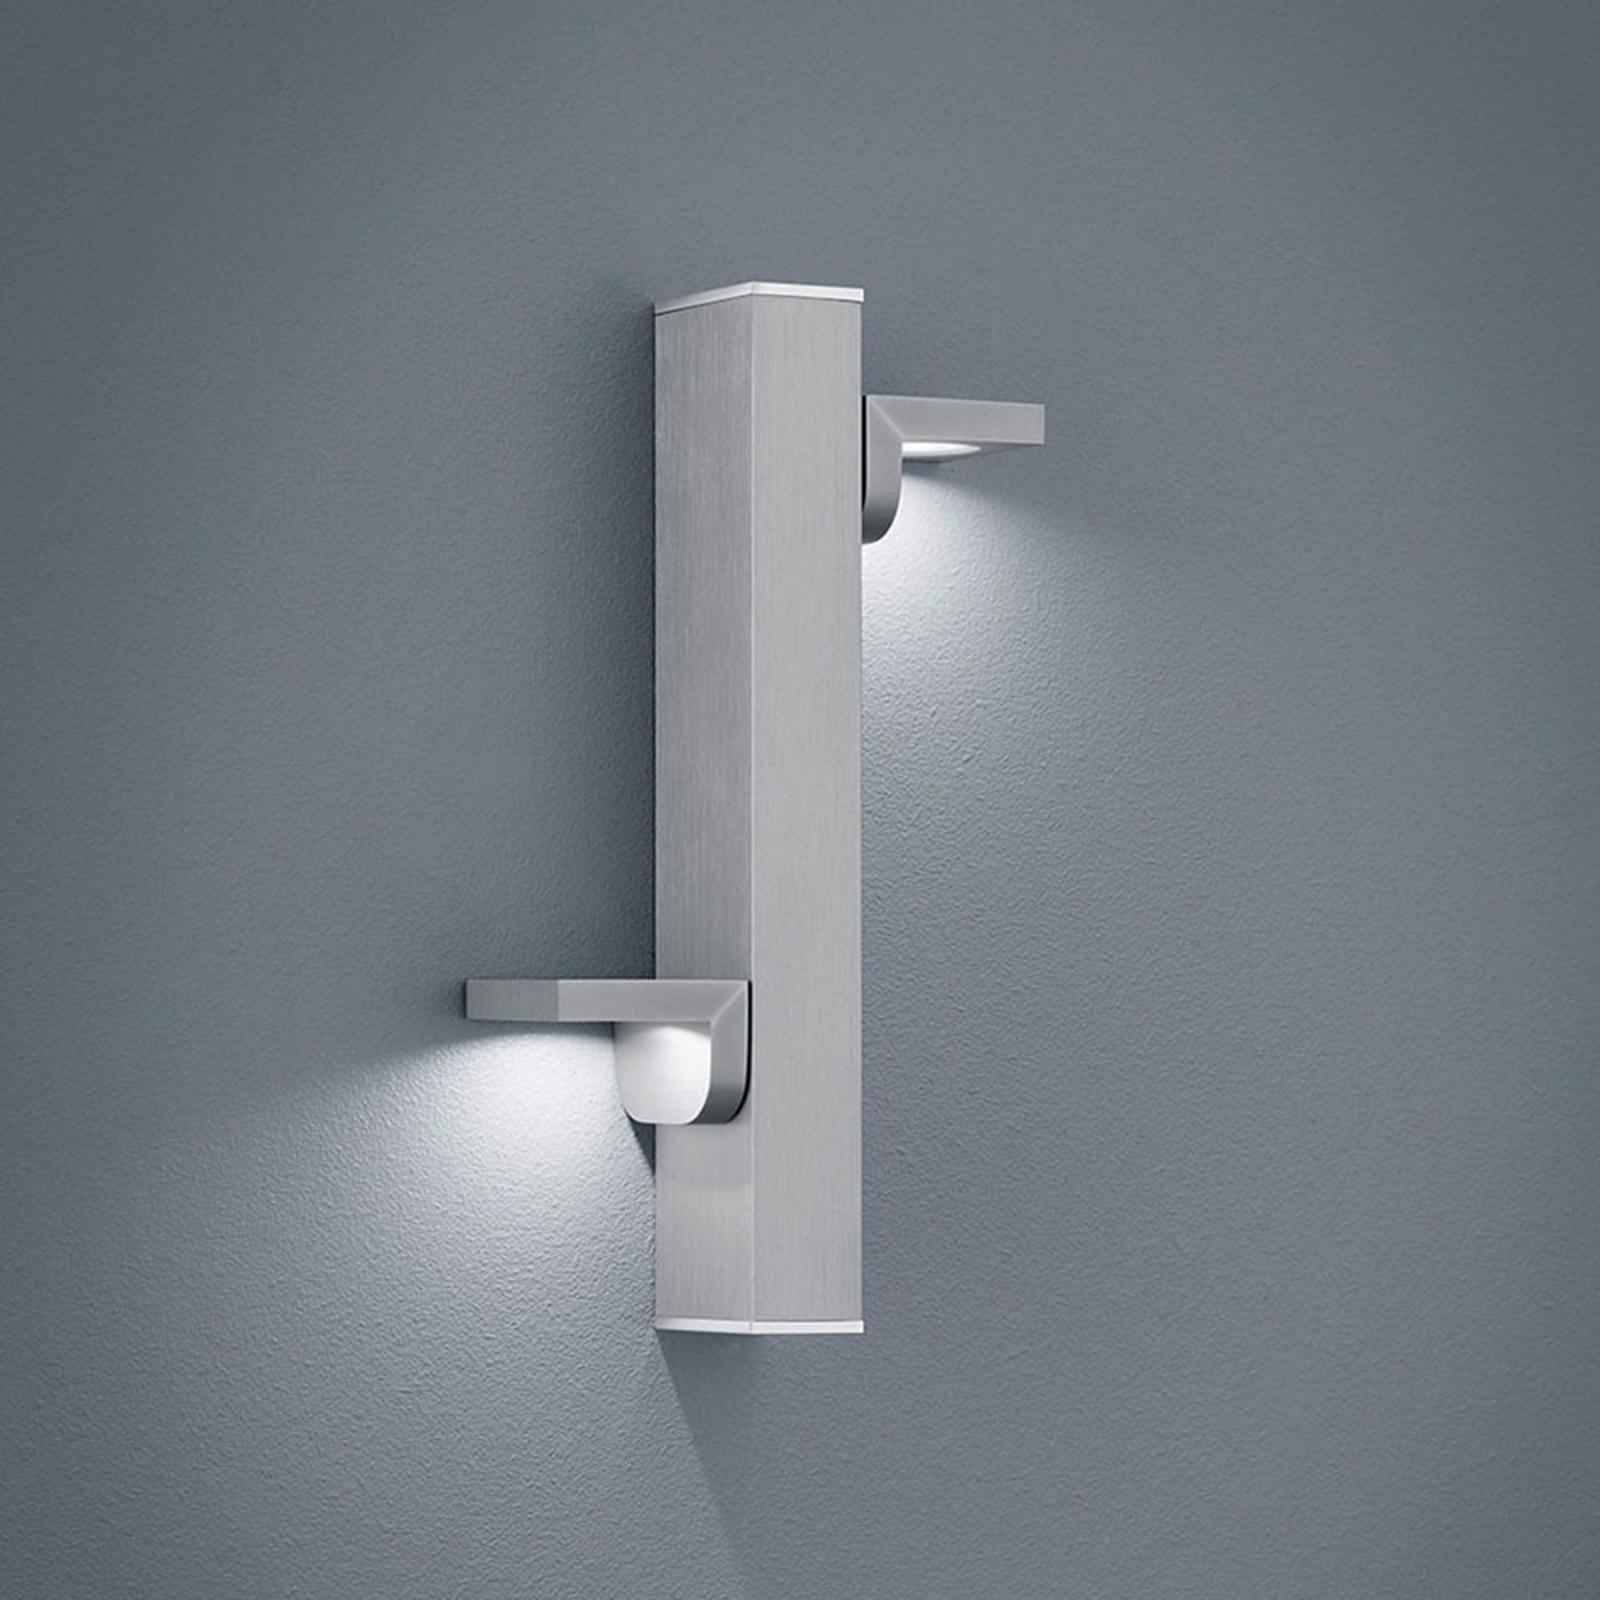 Helestra Arta applique LED nichel satinato/cromo